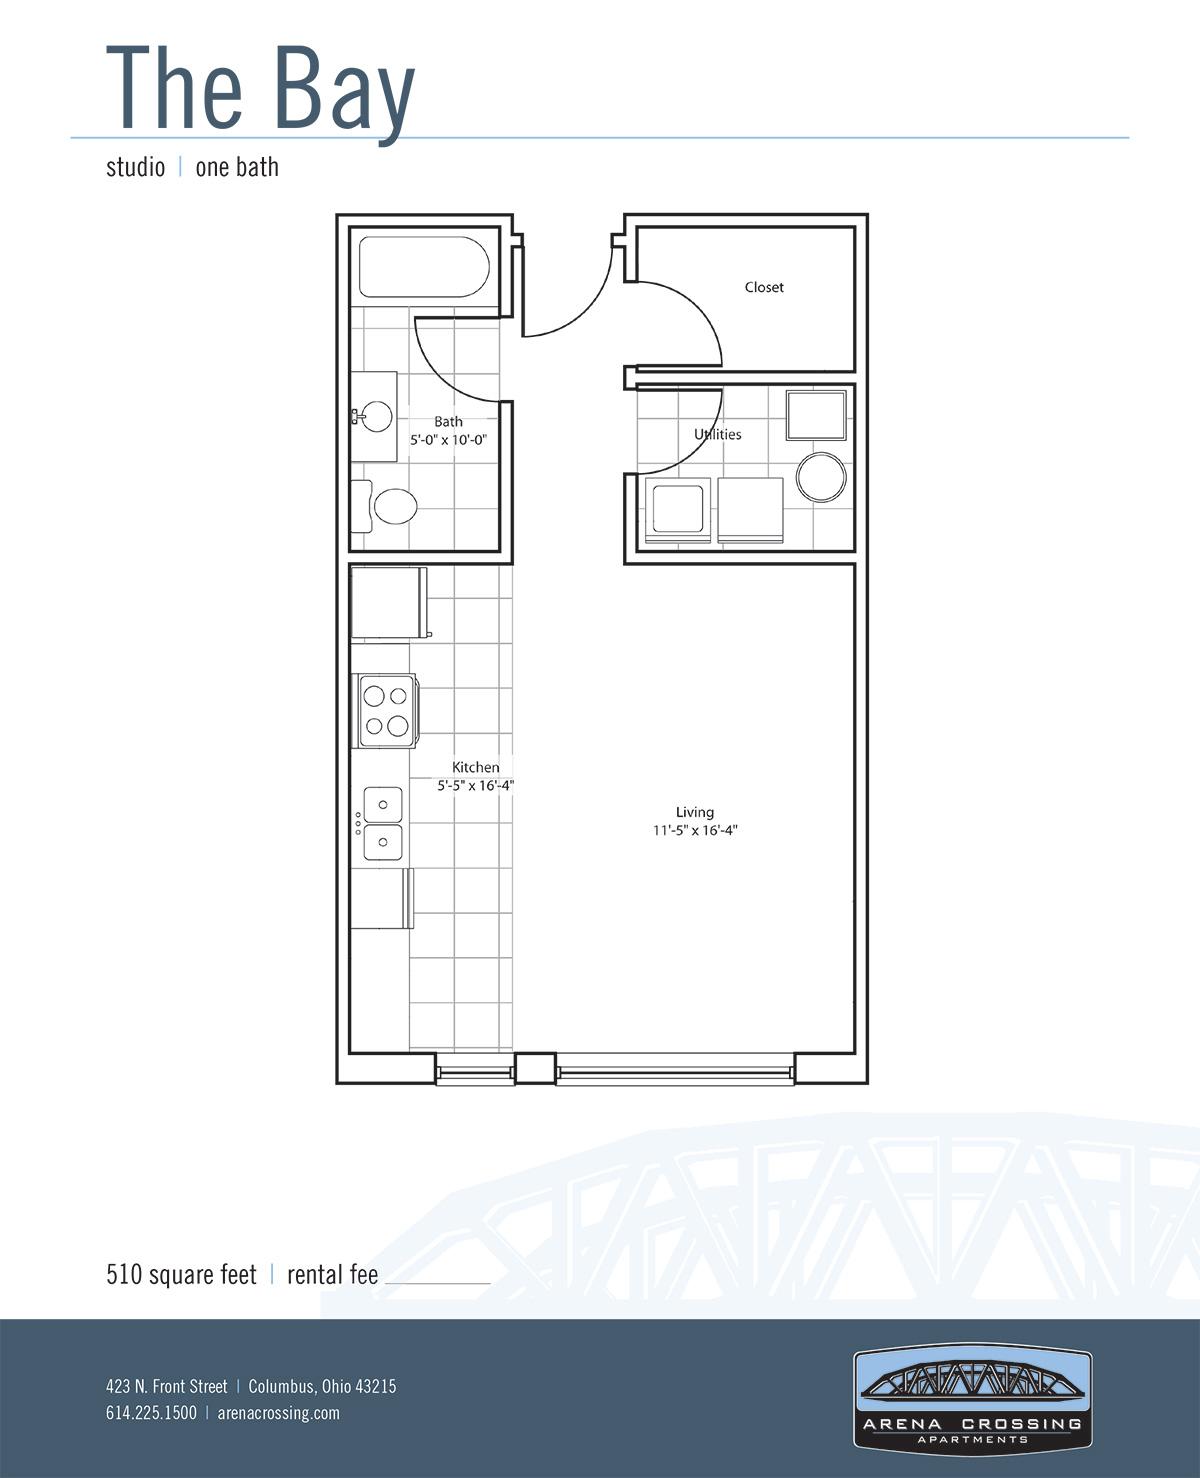 apartments in downtown columbus arena crossing studio